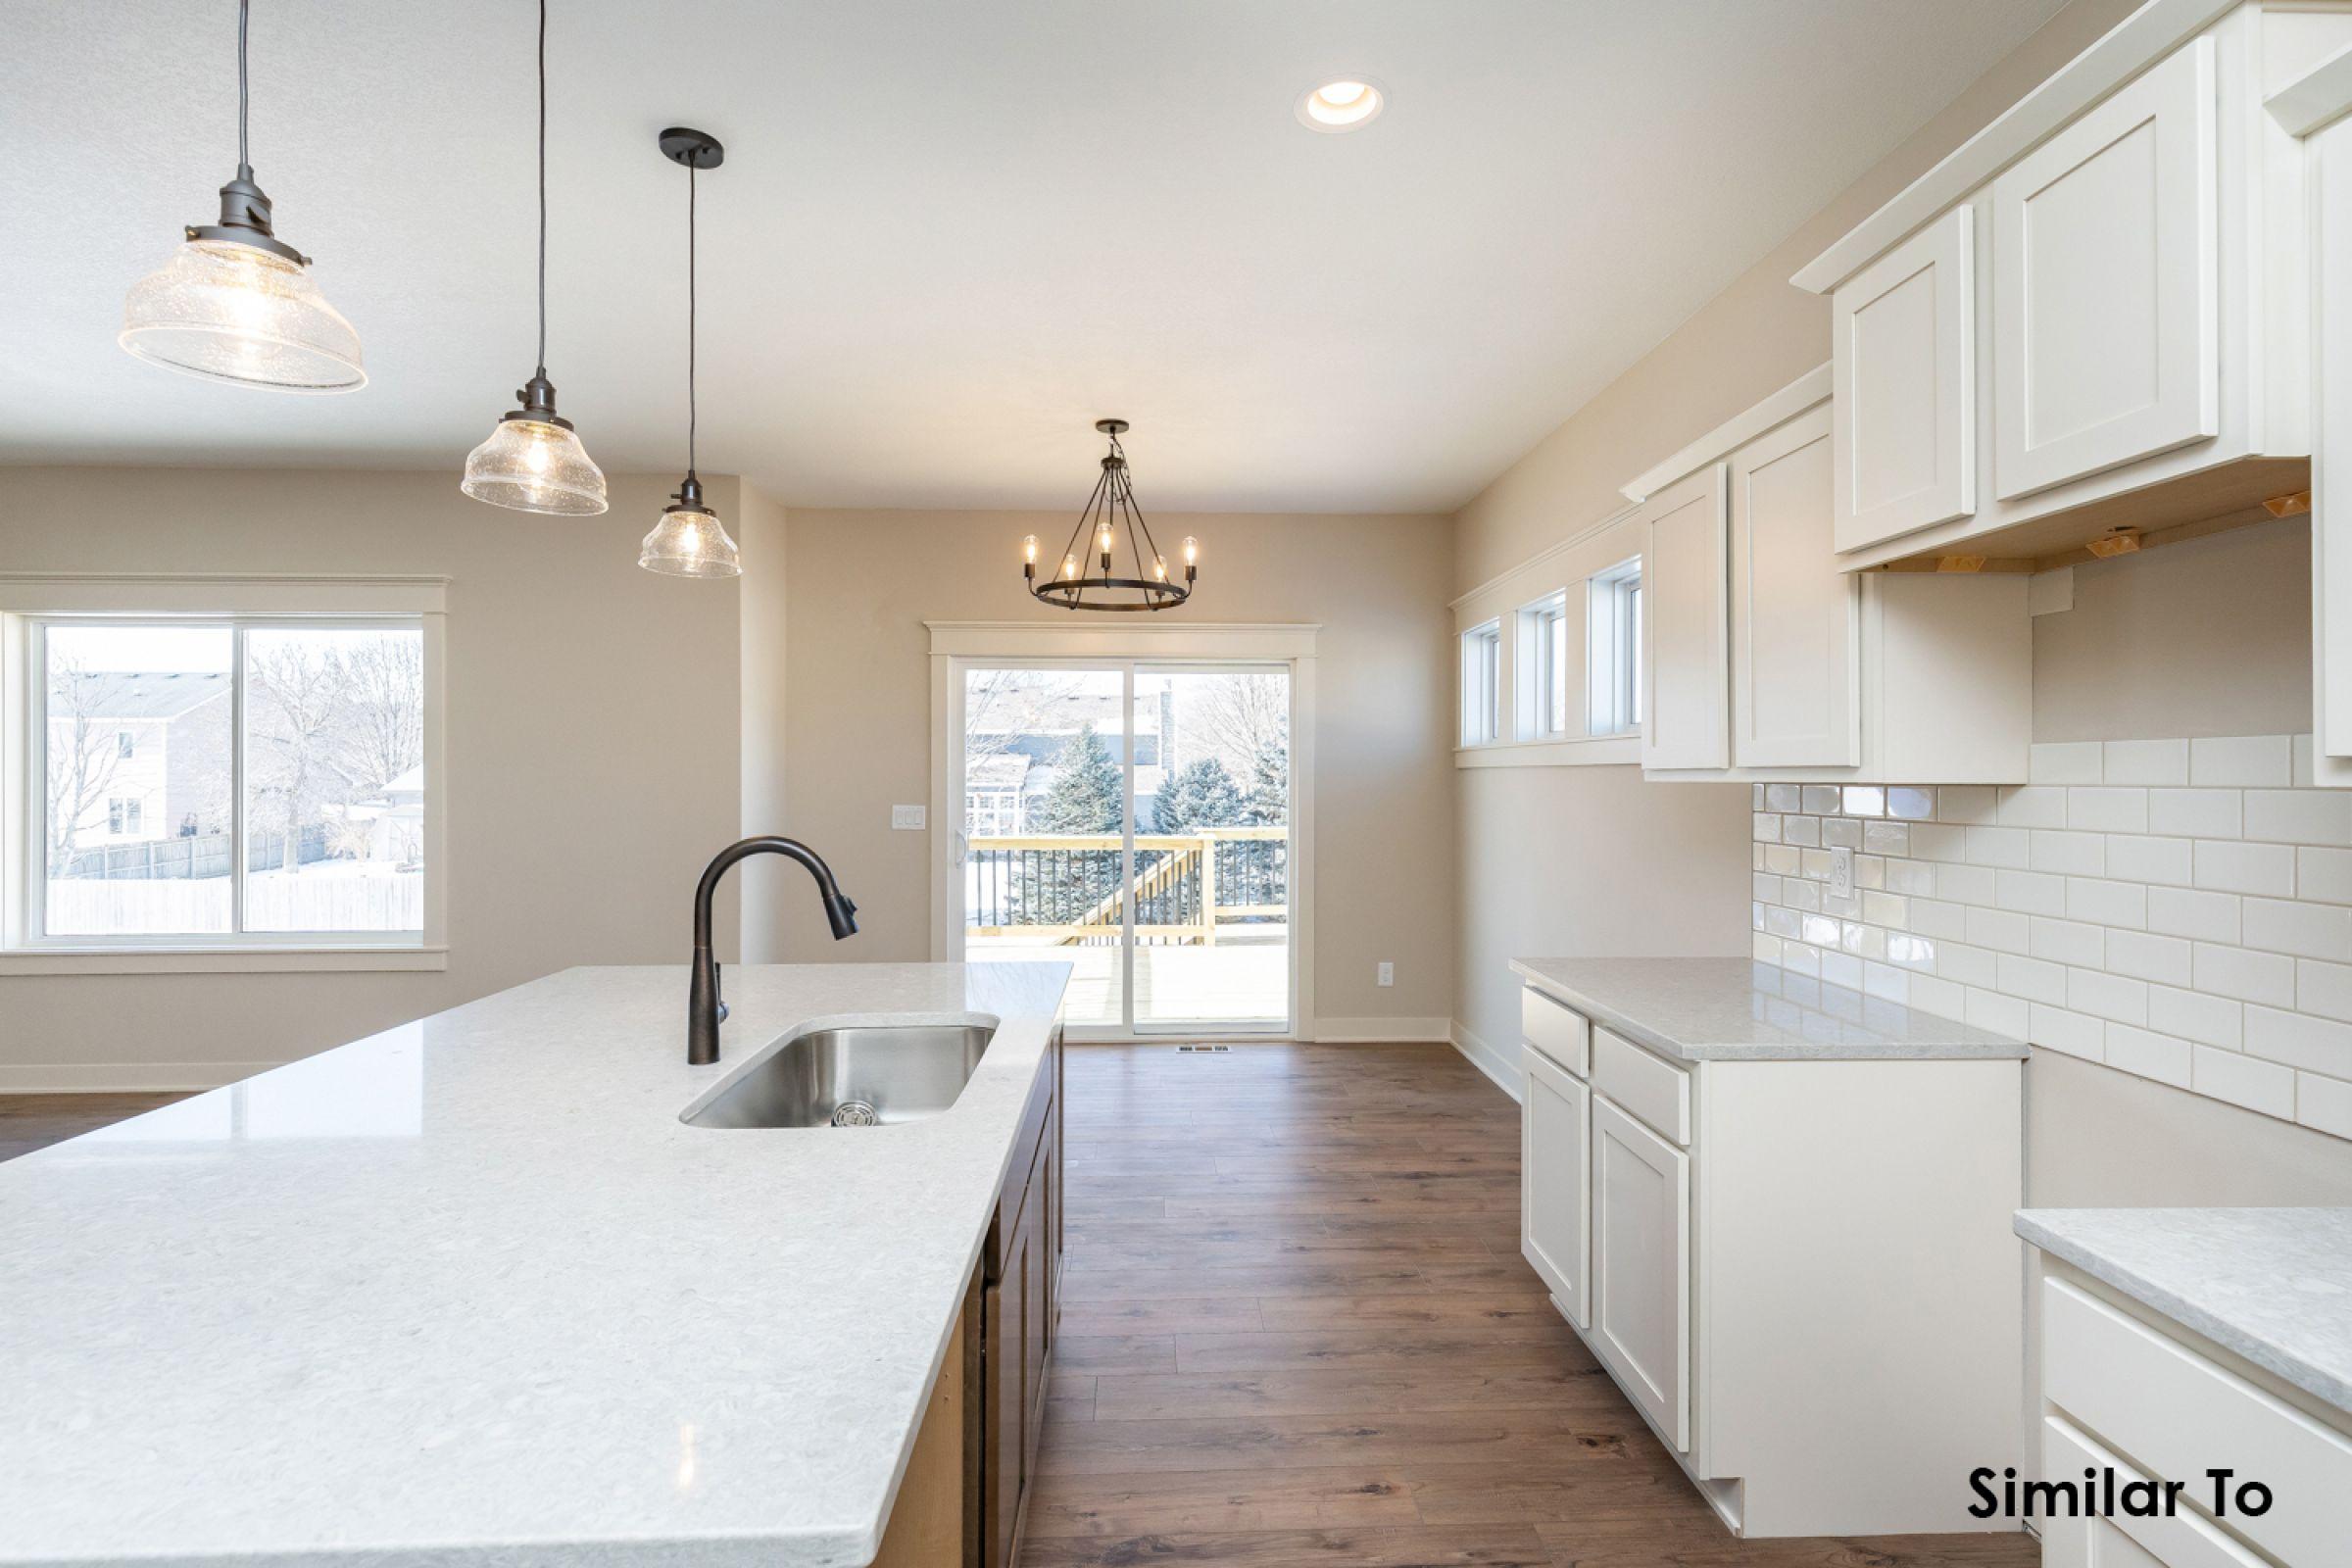 residential-warren-county-iowa-1-acres-listing-number-14995-7-2020-08-03-165349.jpg